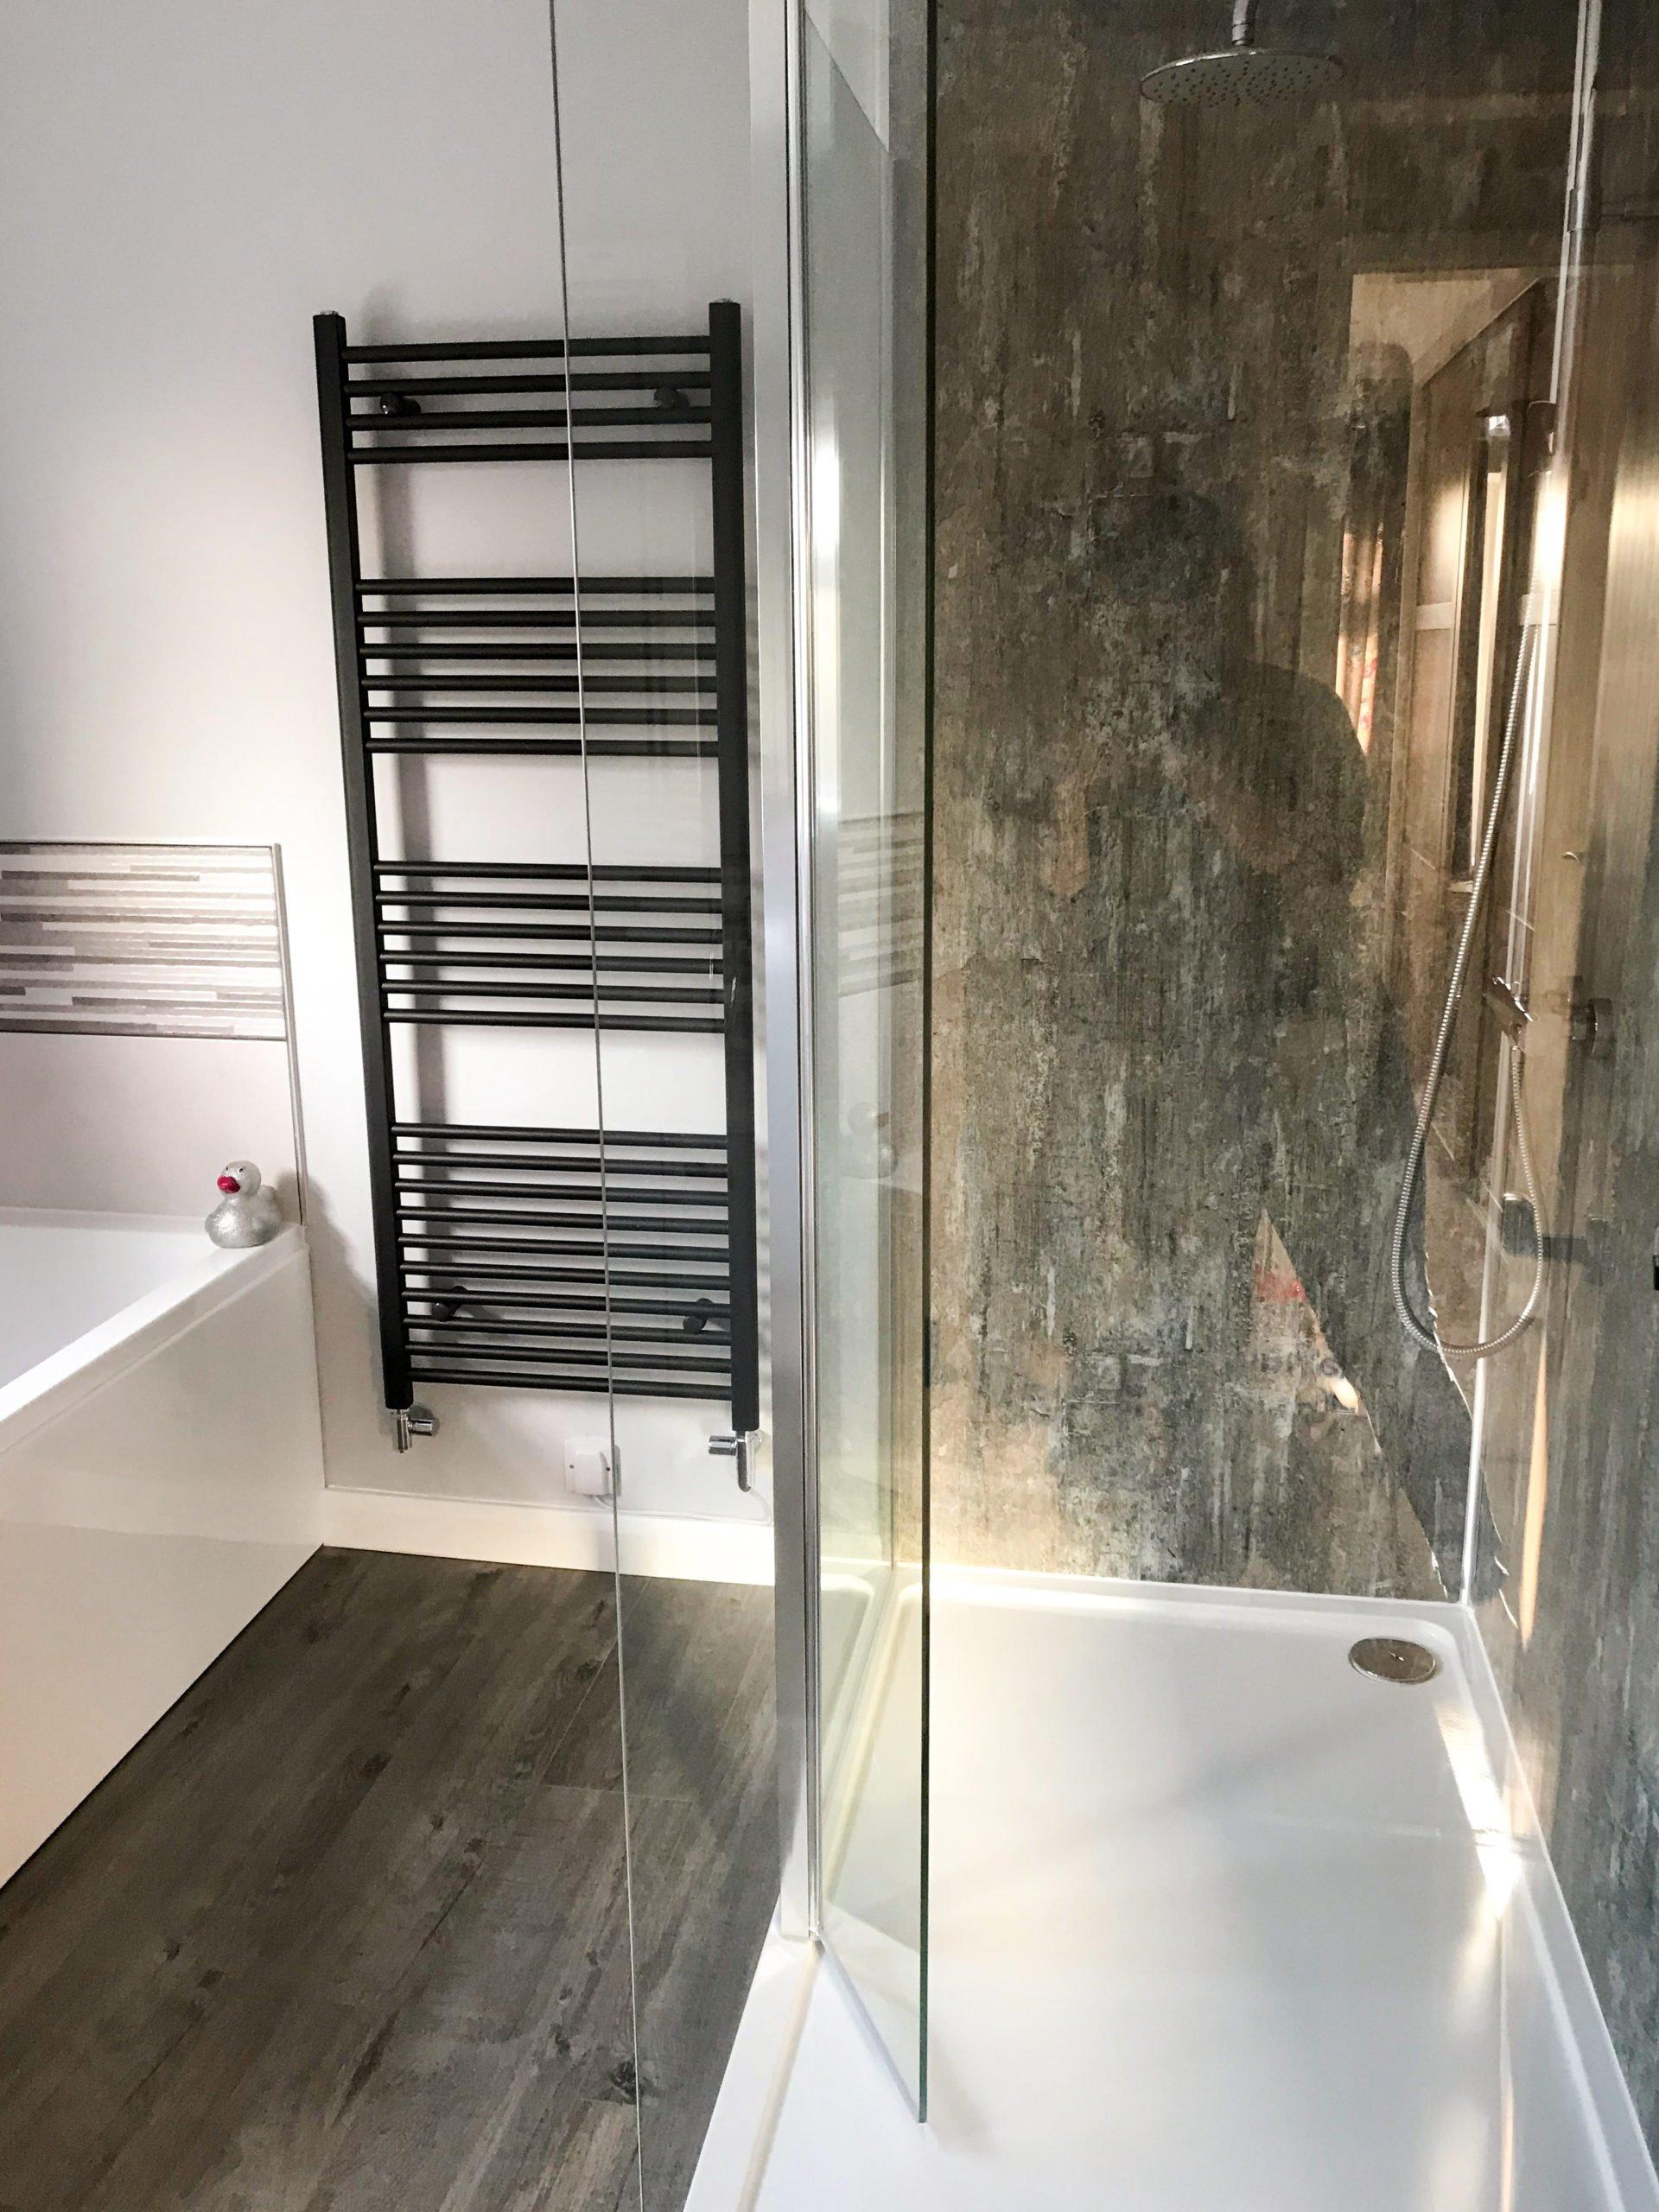 Walk-in shower with Eastbrooks Wingrave radiator